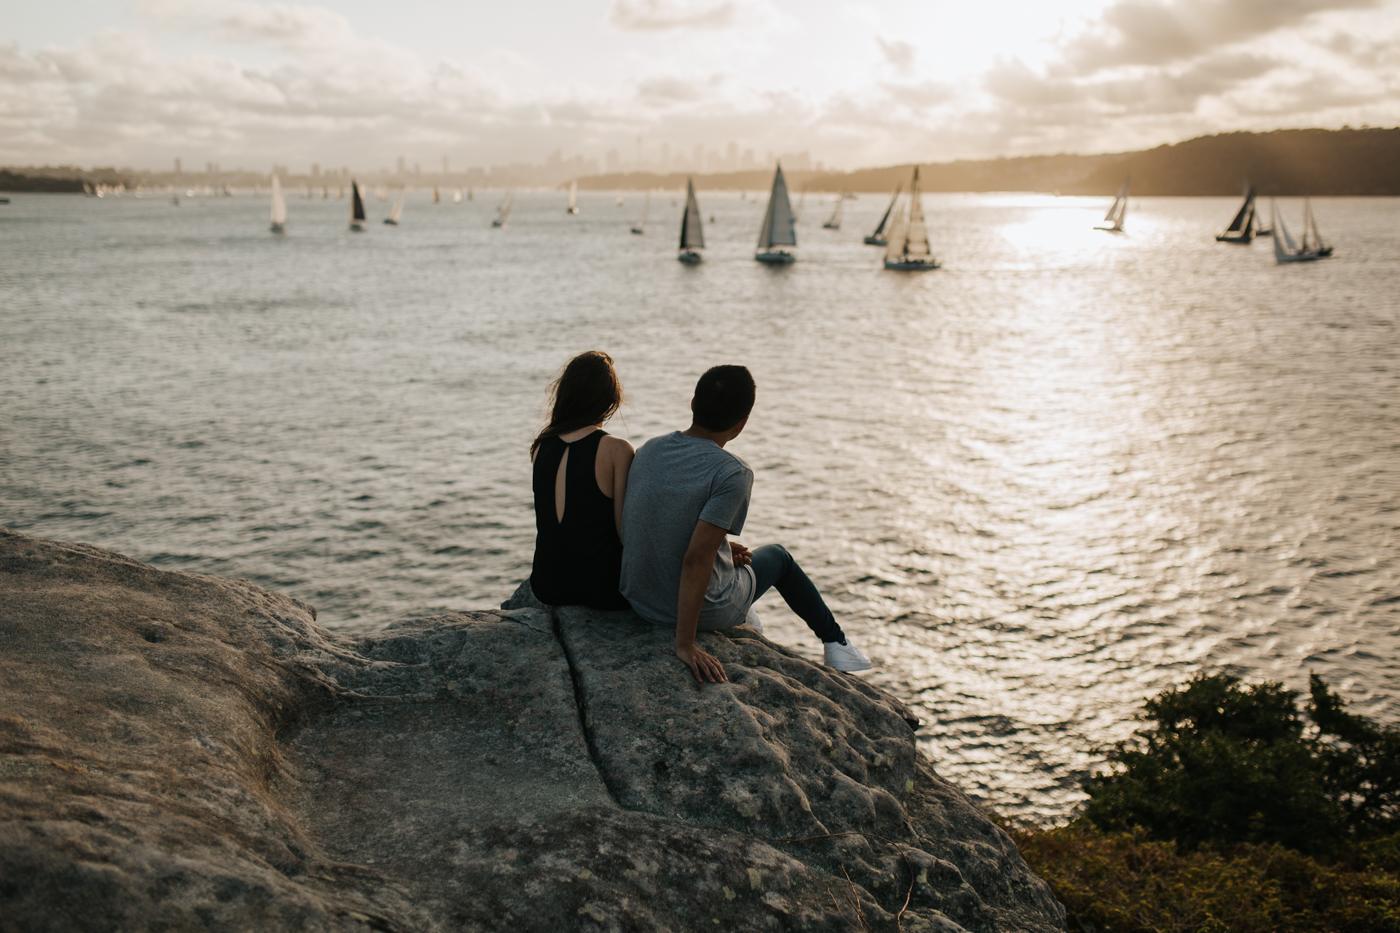 James & Caitie Engagement - Watsons Bay - Samantha Heather Photography-40.jpg